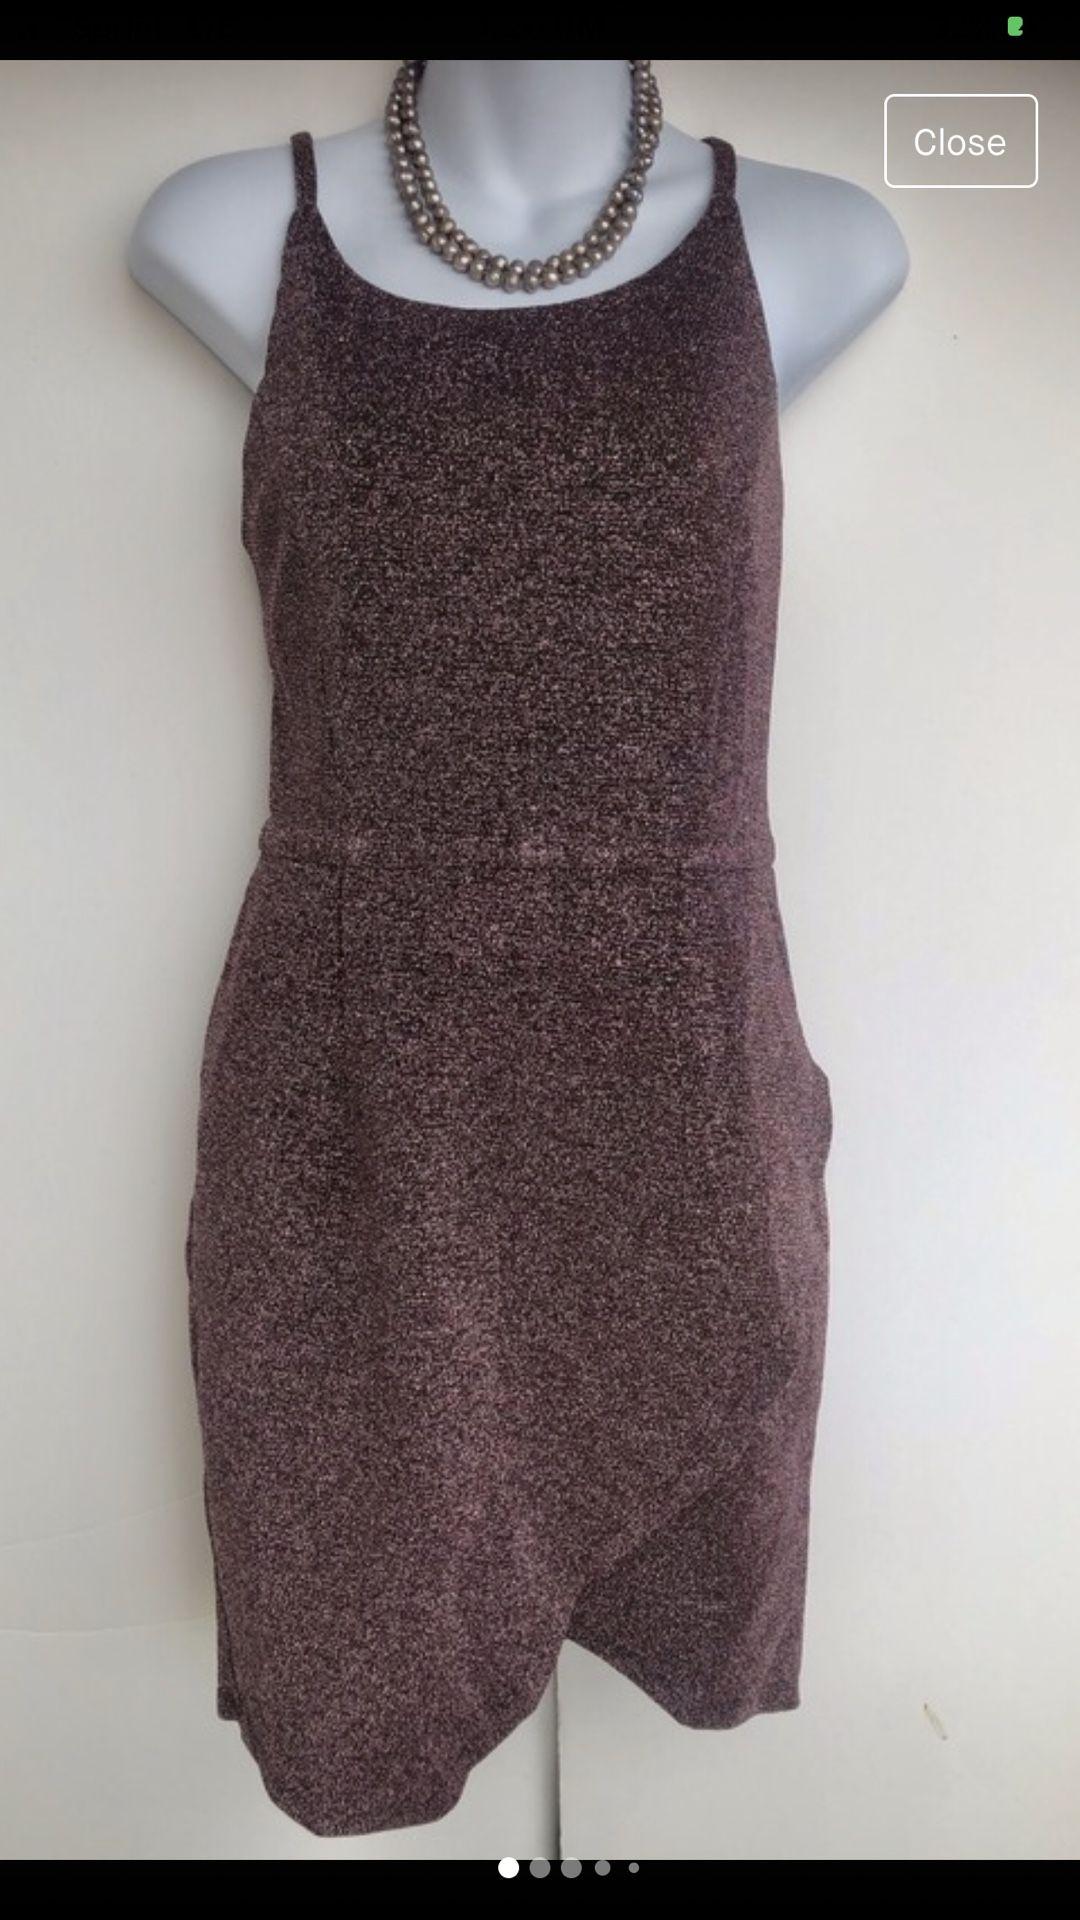 Metallic Dark Plum Cocktail Dress